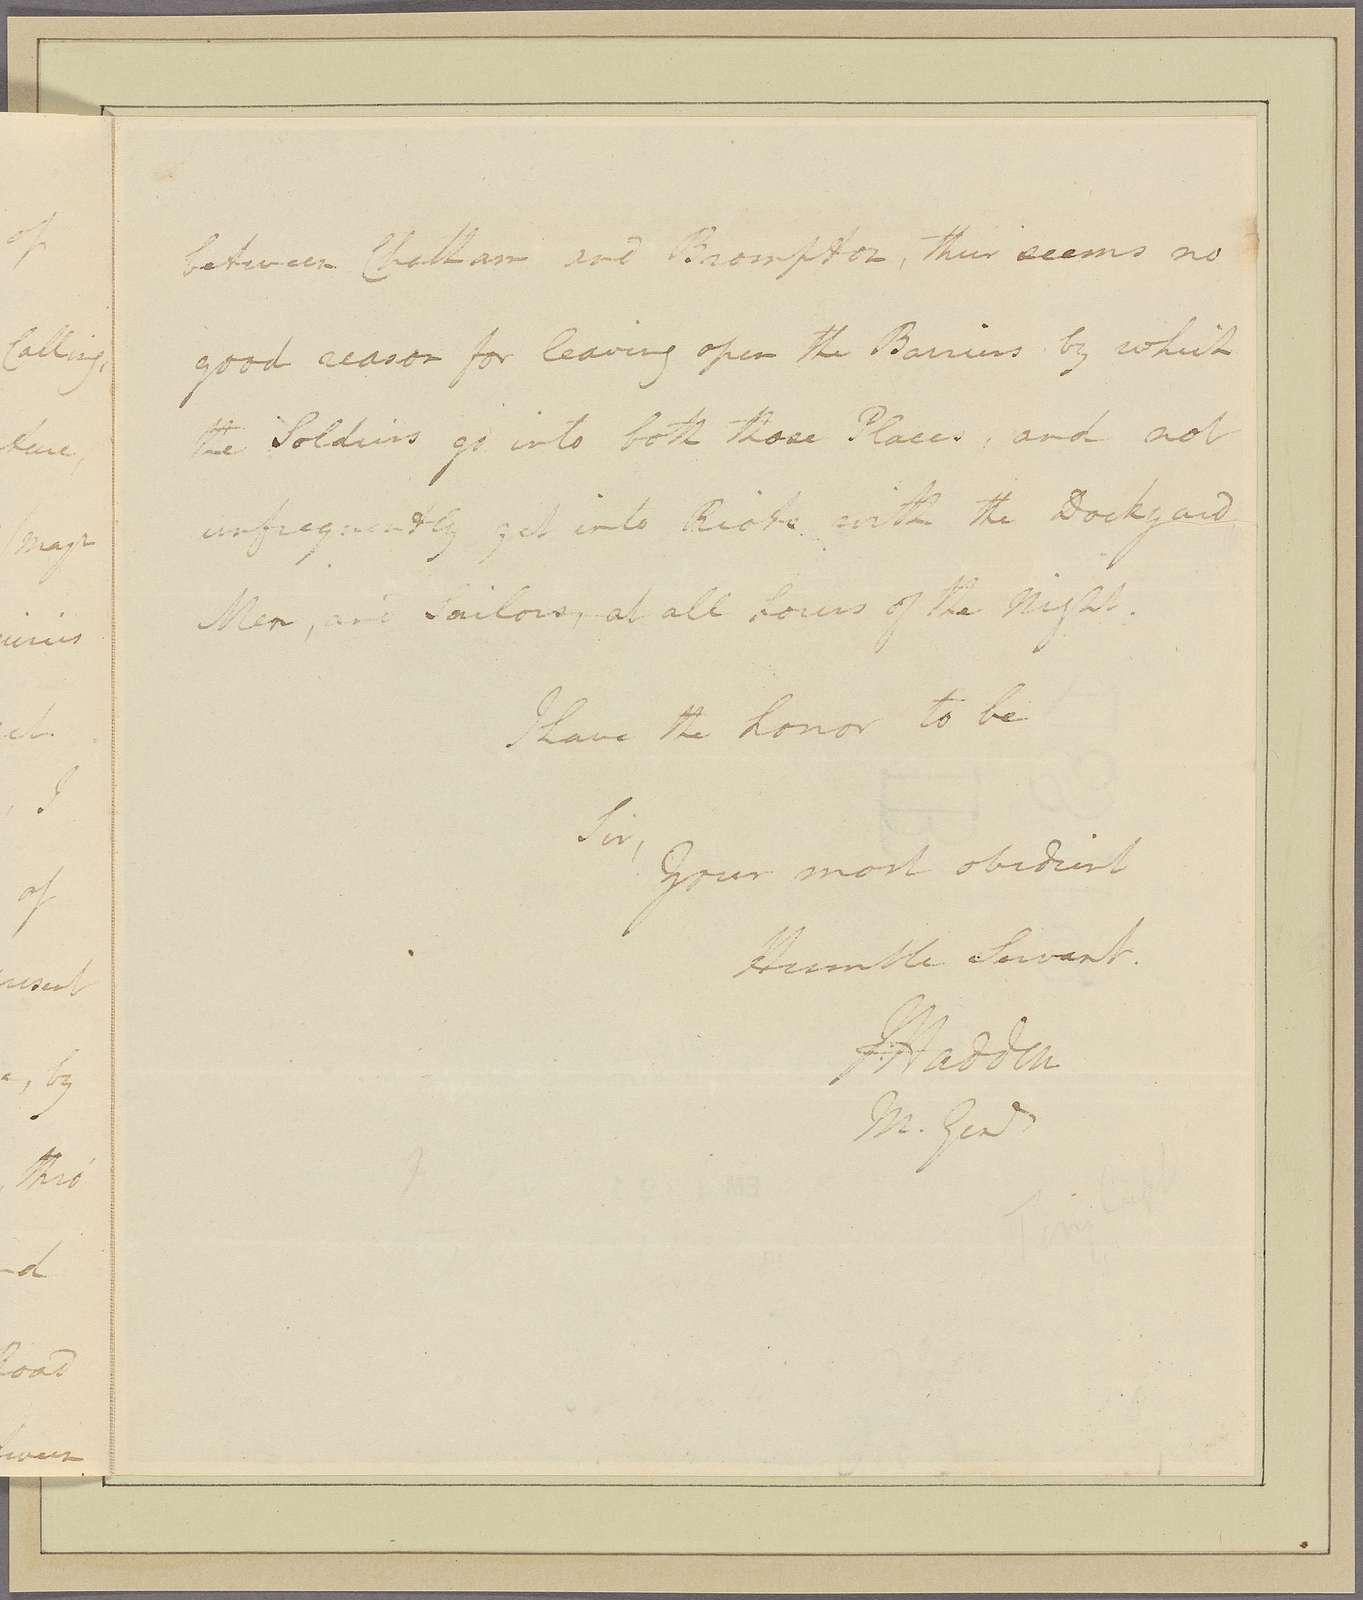 Letter to Capt. [Thomas?] Pemberton, Head Quarters [Newburg]